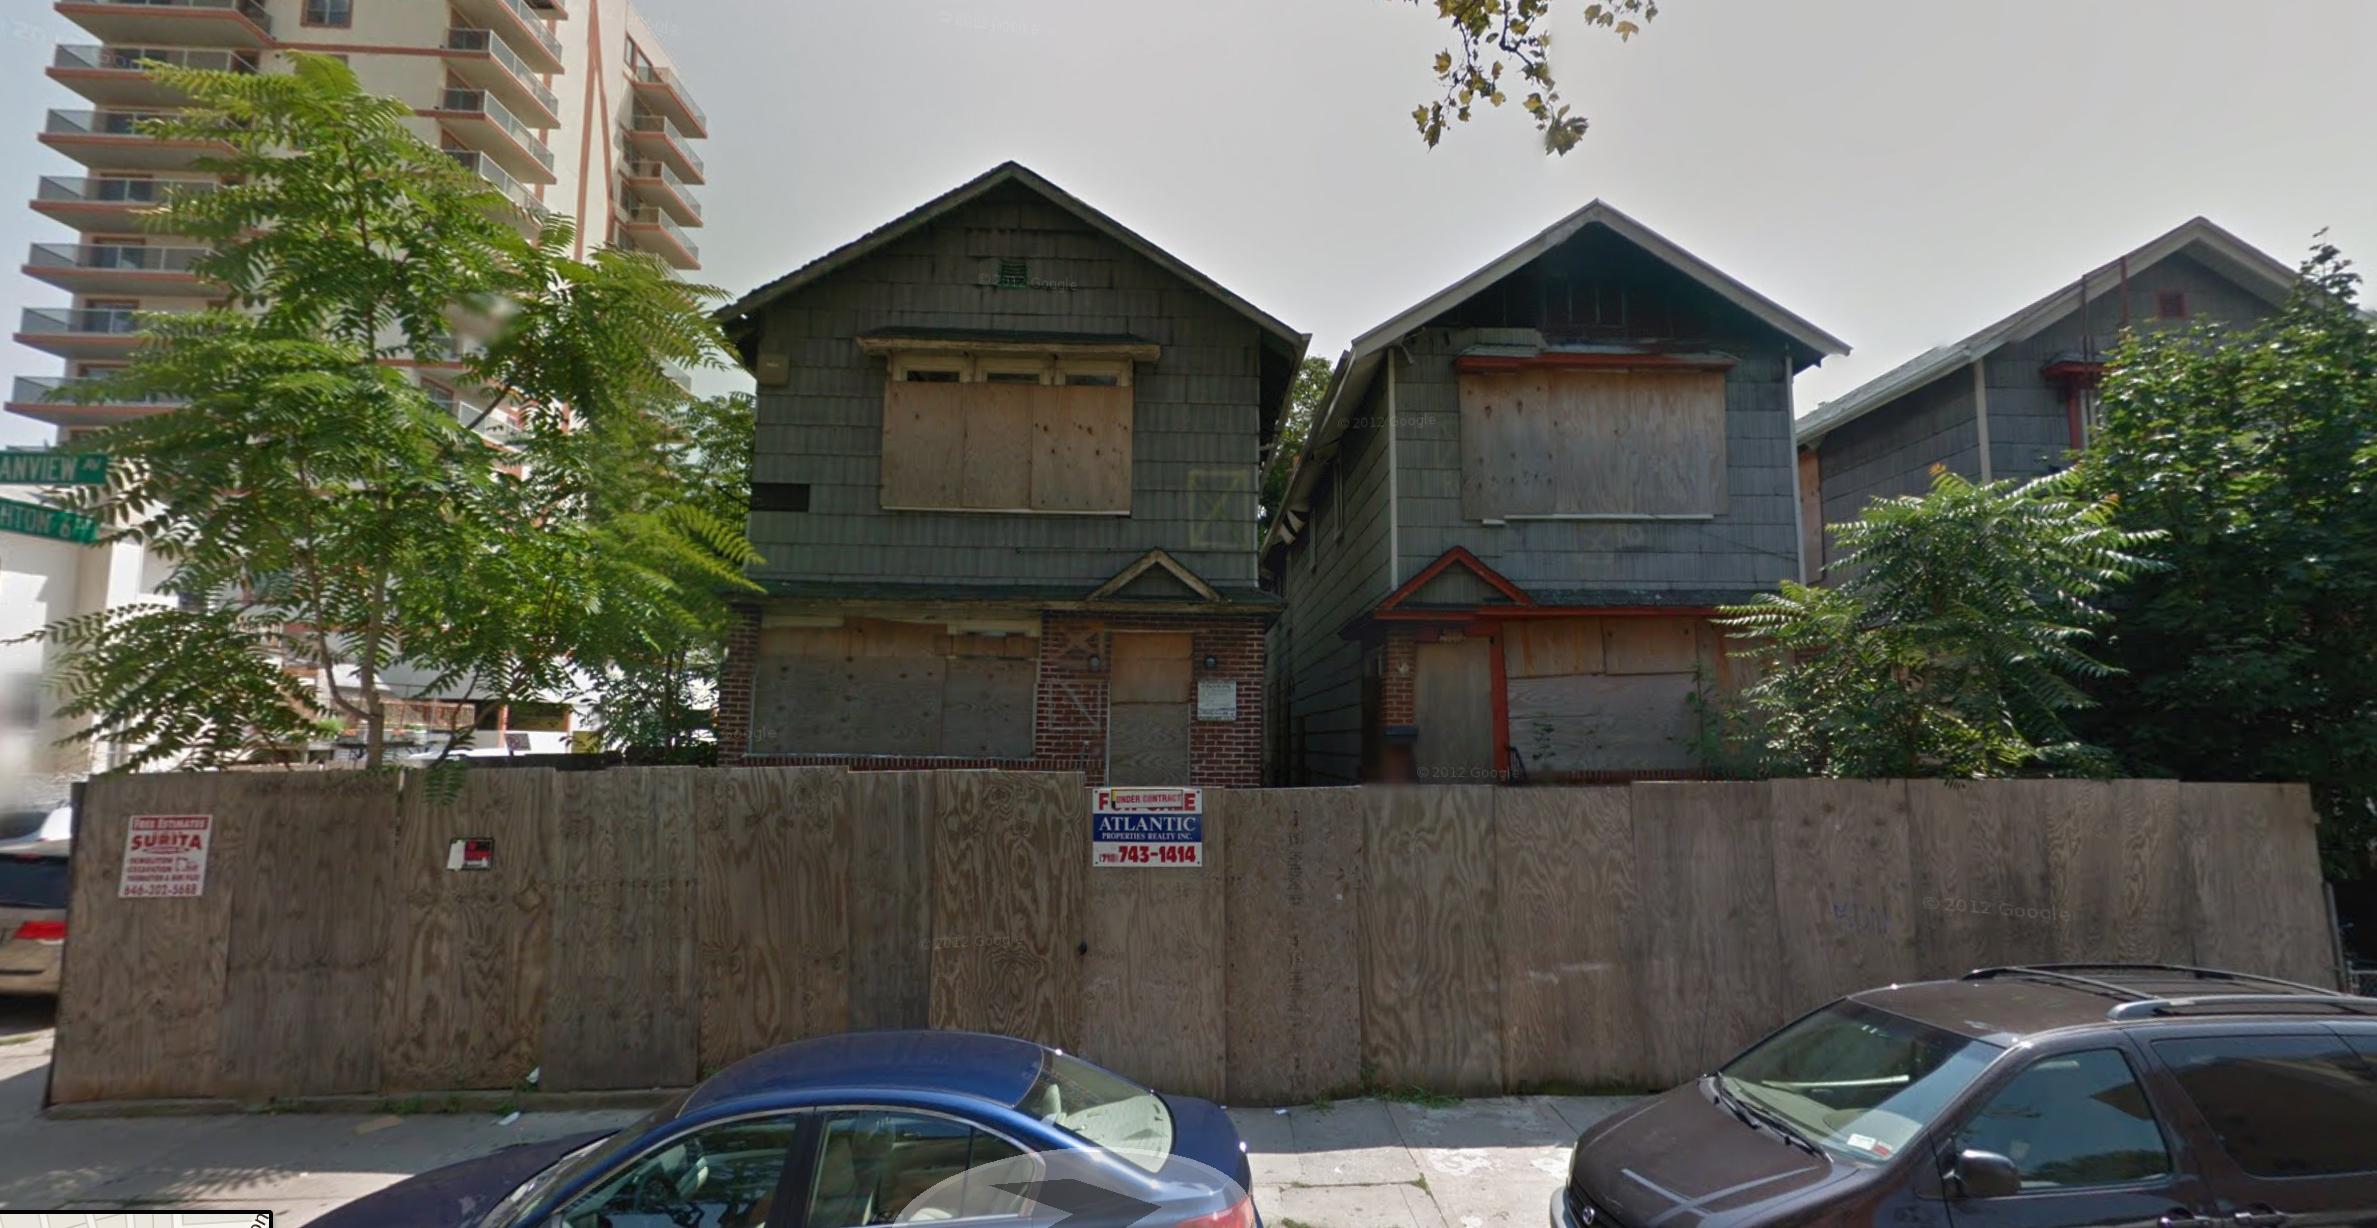 524 Ocean View Avenue. Via Google Maps